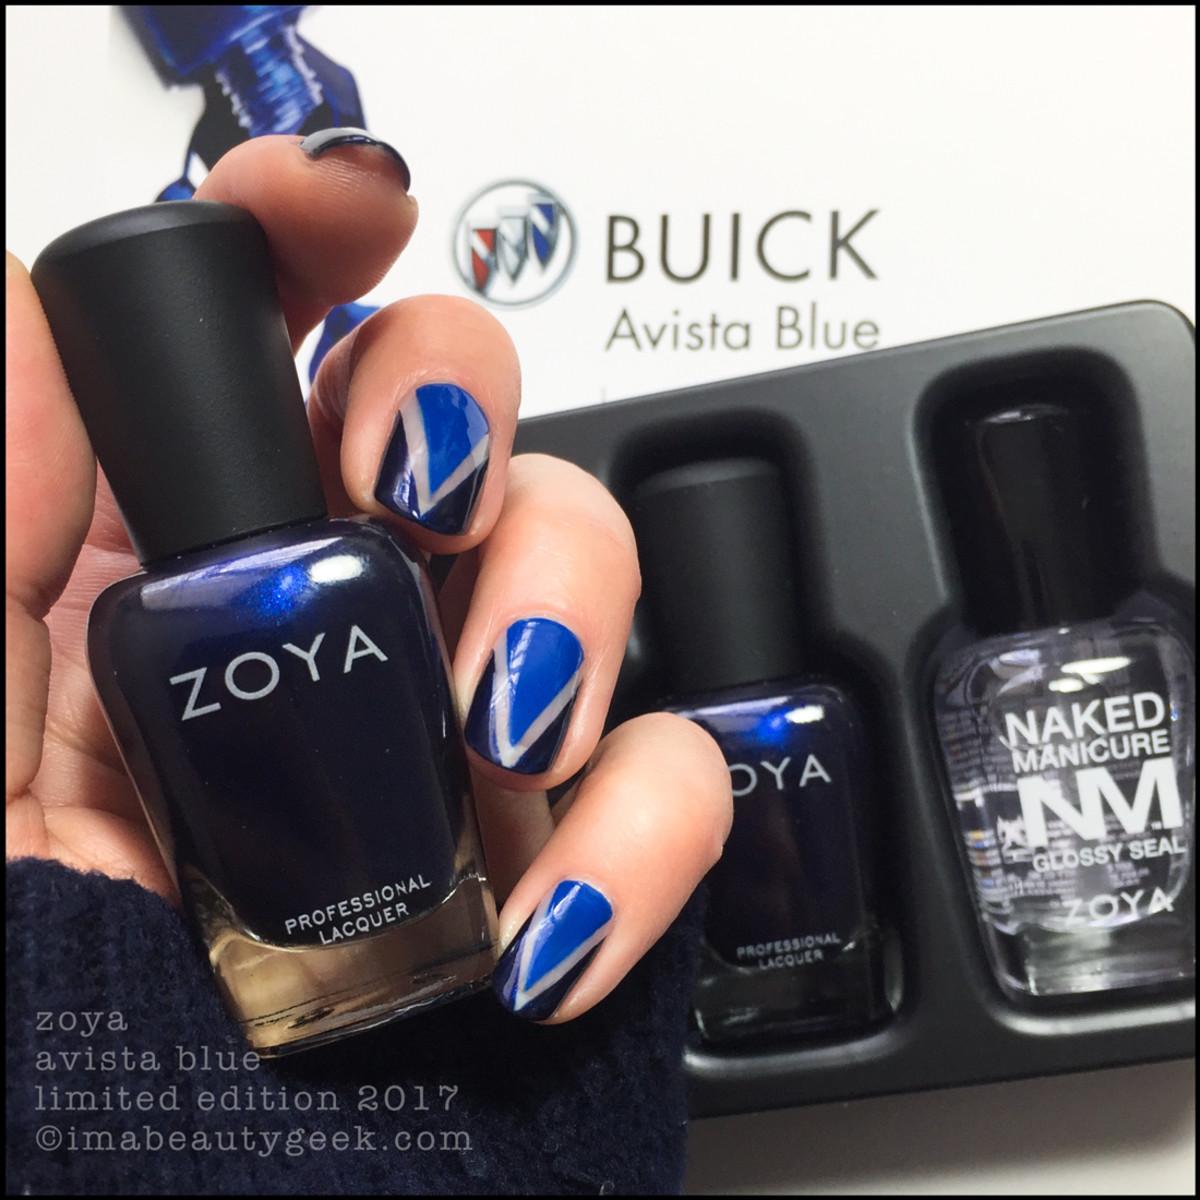 Zoya Avista Blue_BuickStyle Concept Car